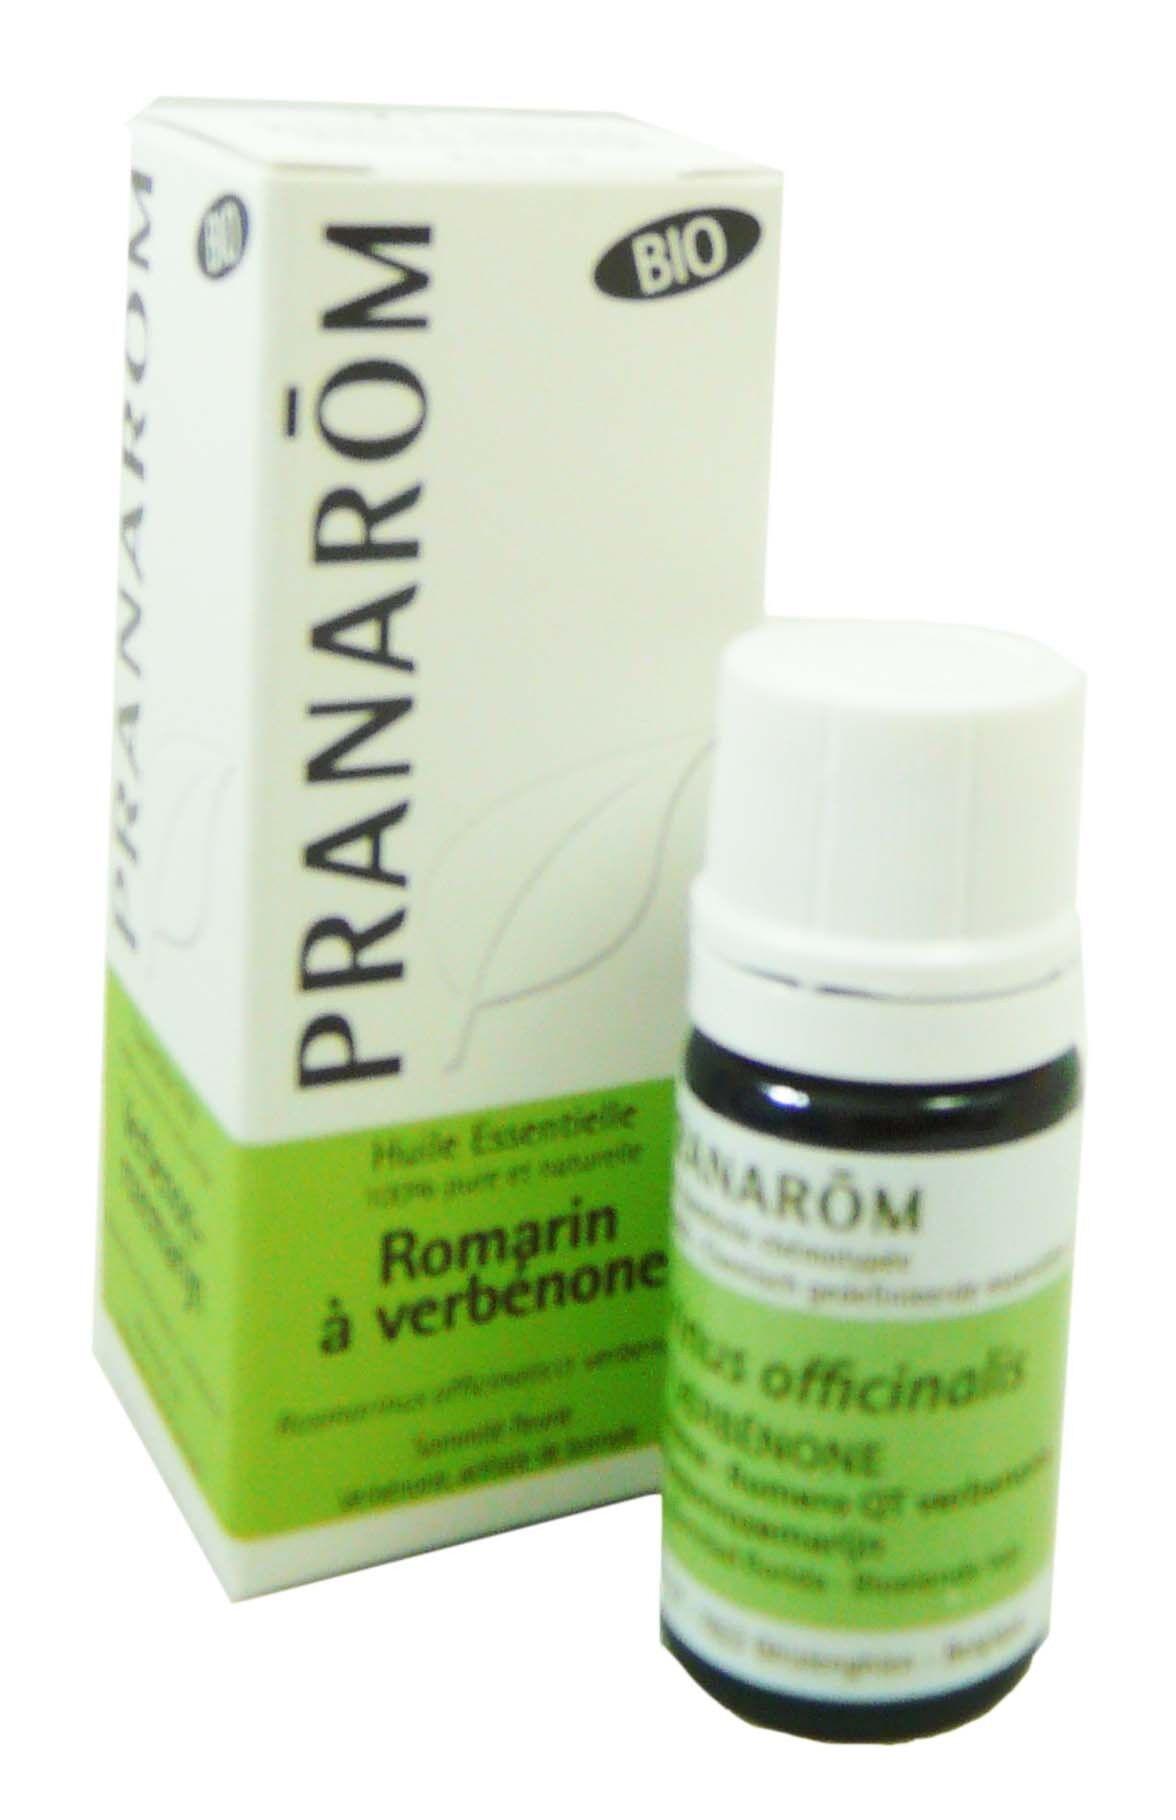 Pranarom huile essentielle bio romarin a verbenone 5ml